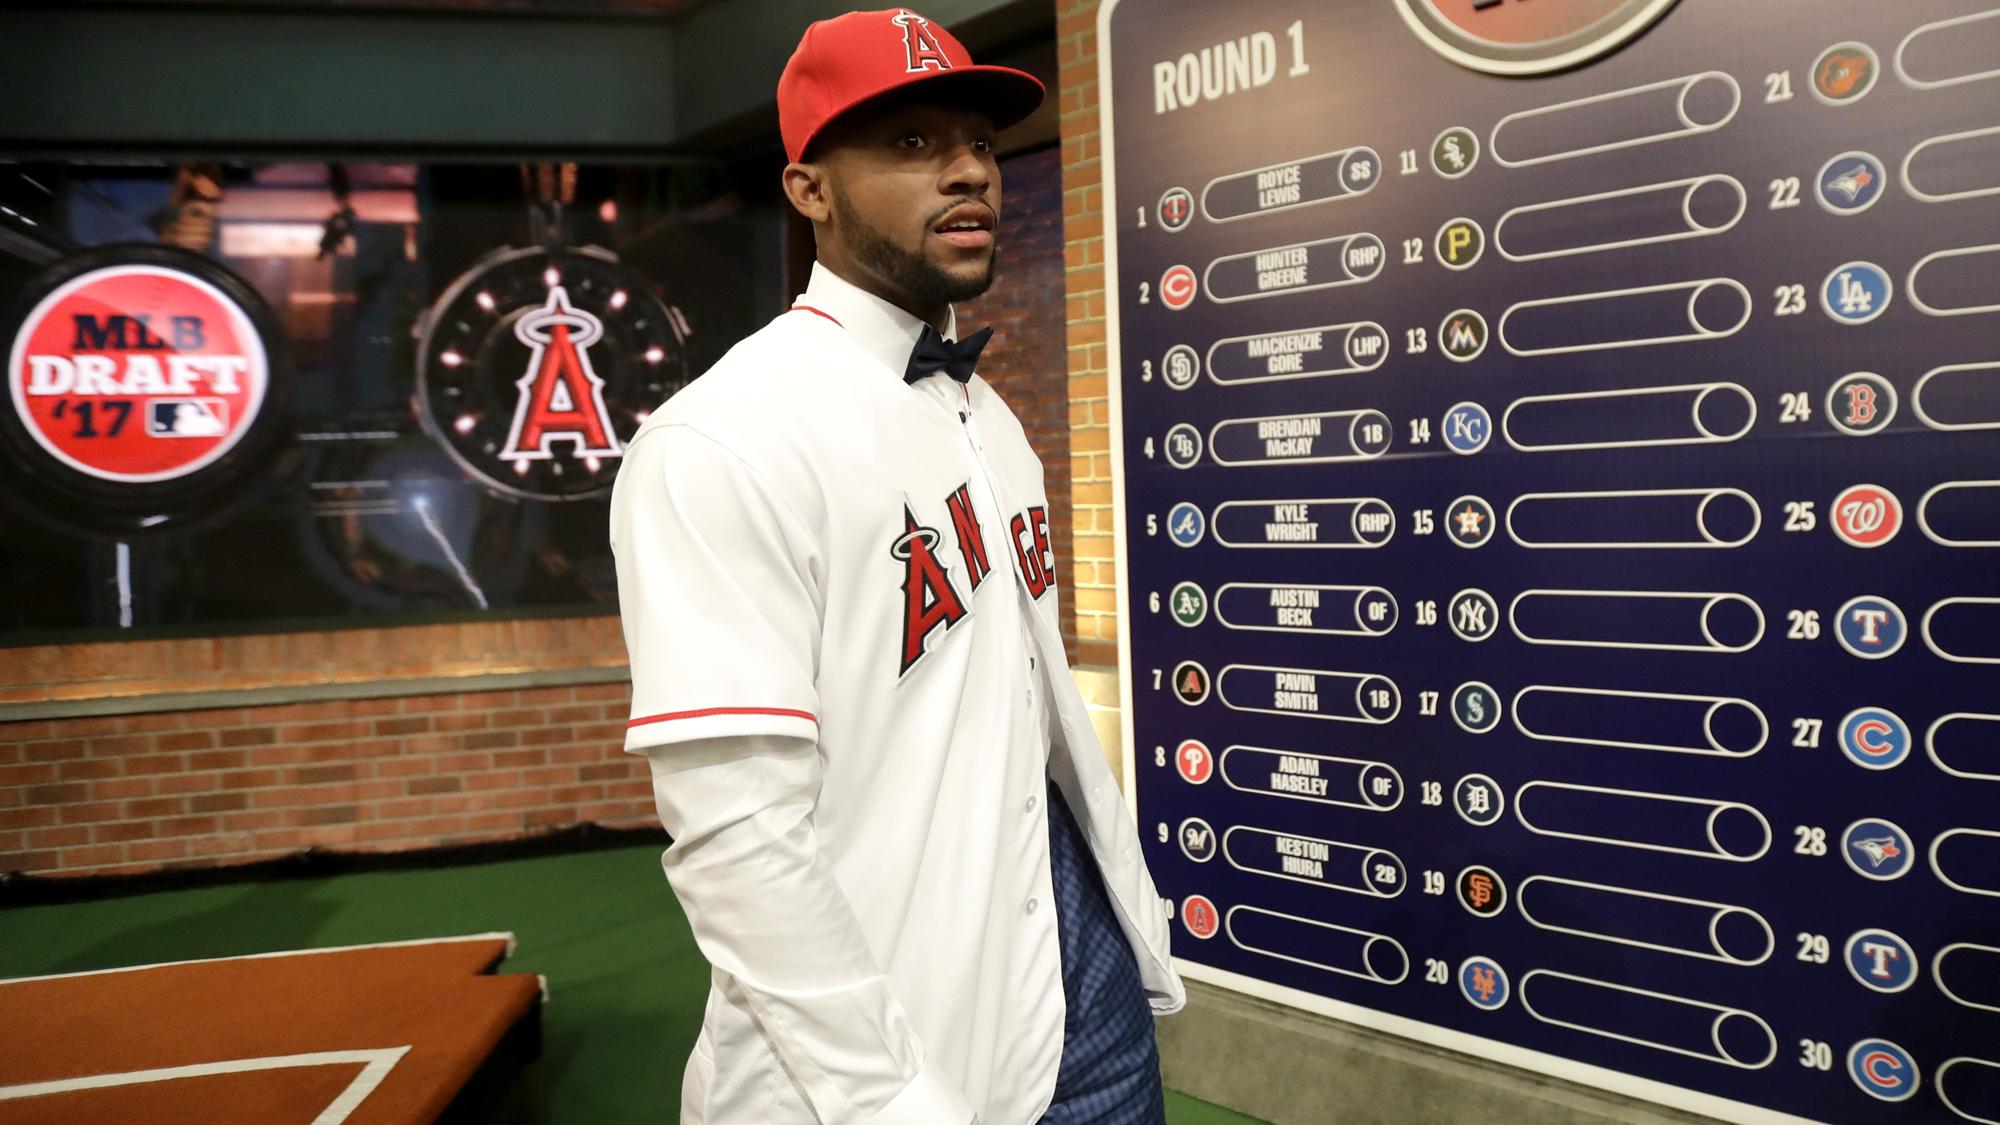 Baseball Draft